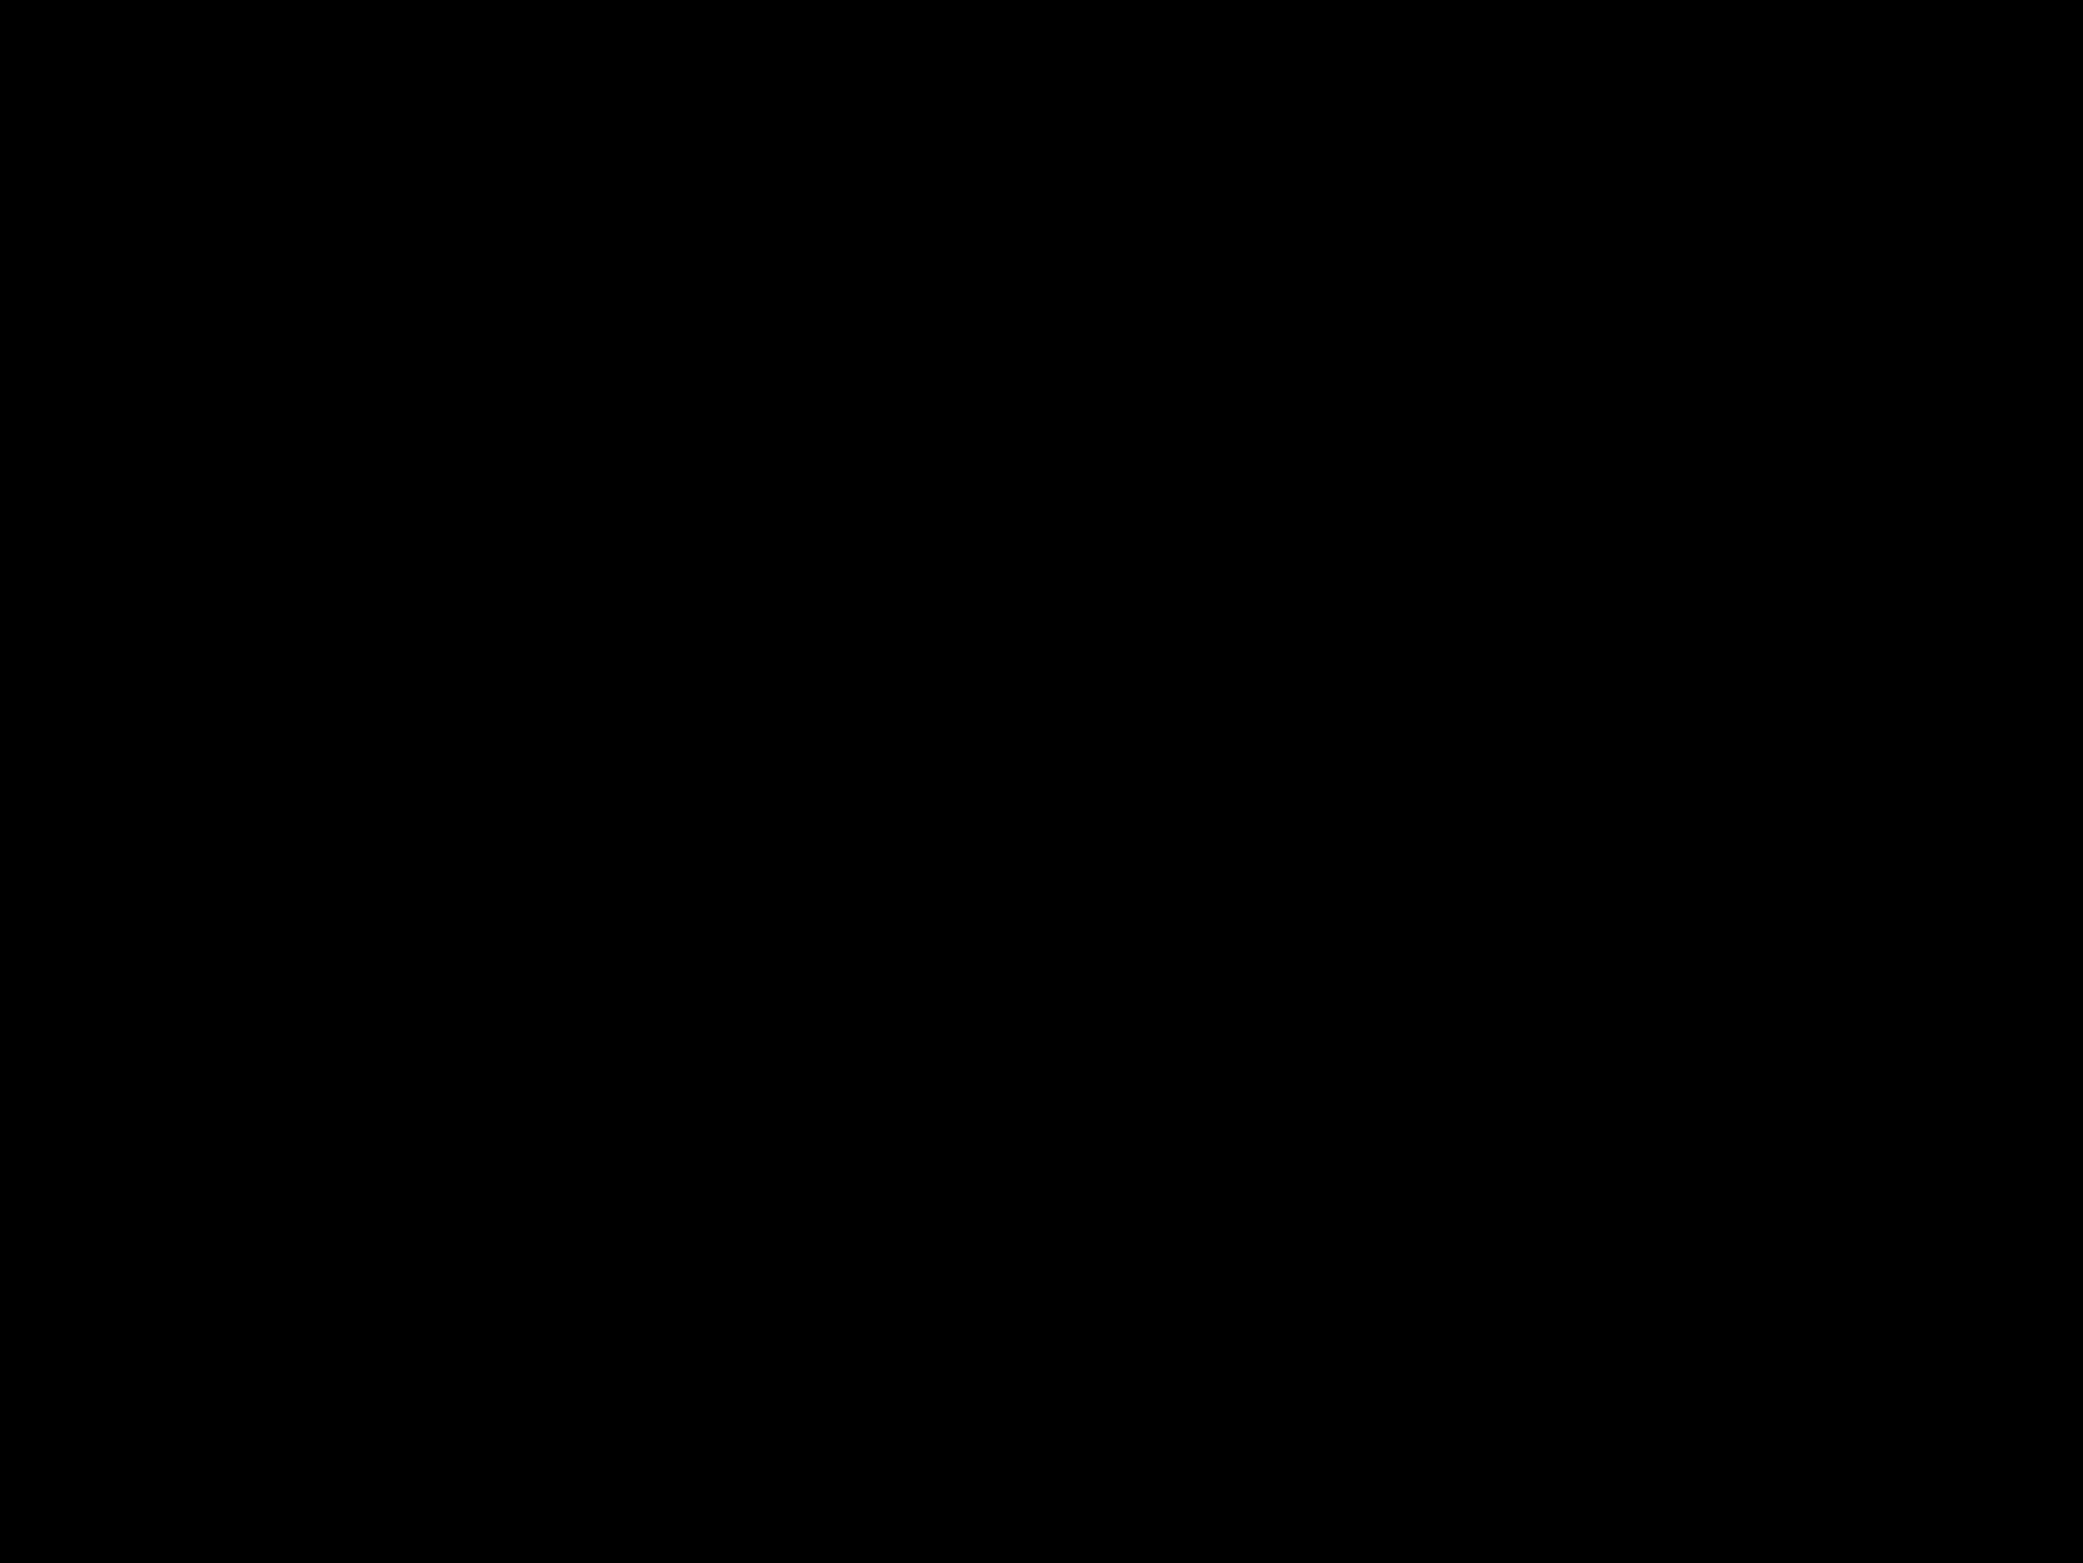 Branding Specialist Branding Logo Design For Beauty Industry